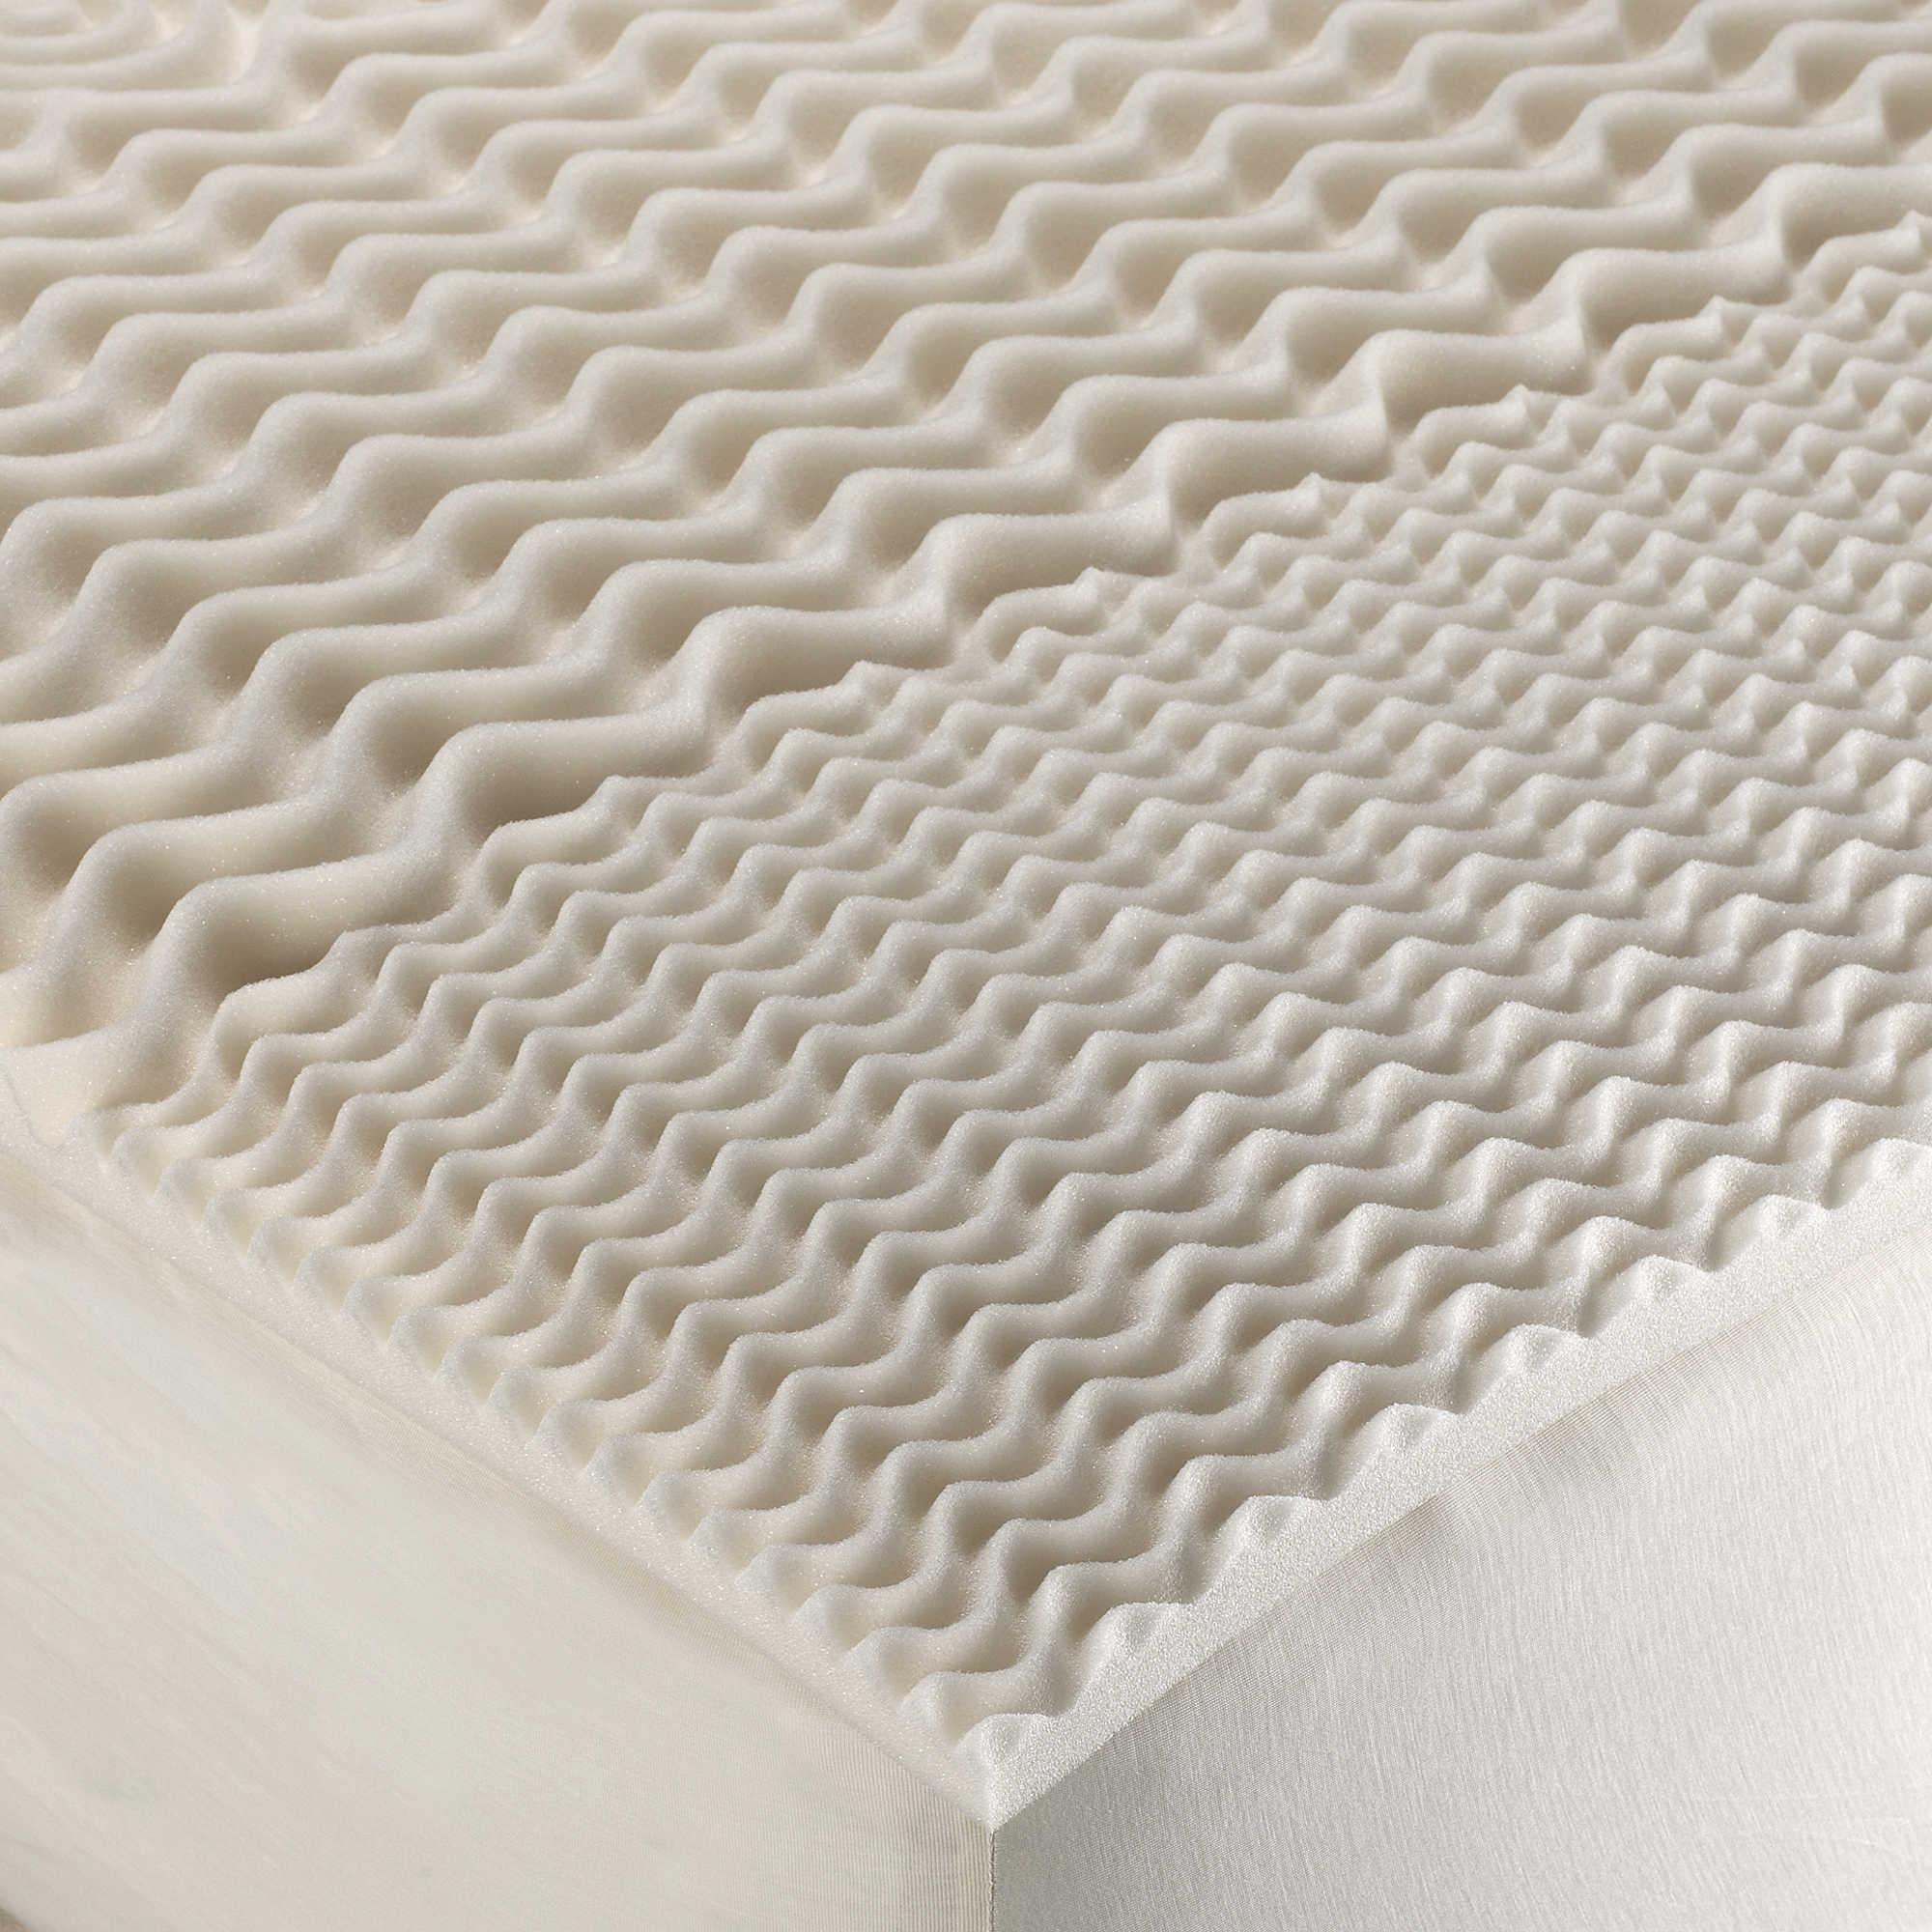 Twin Foam Mattress Pad Decor IdeasDecor Ideas